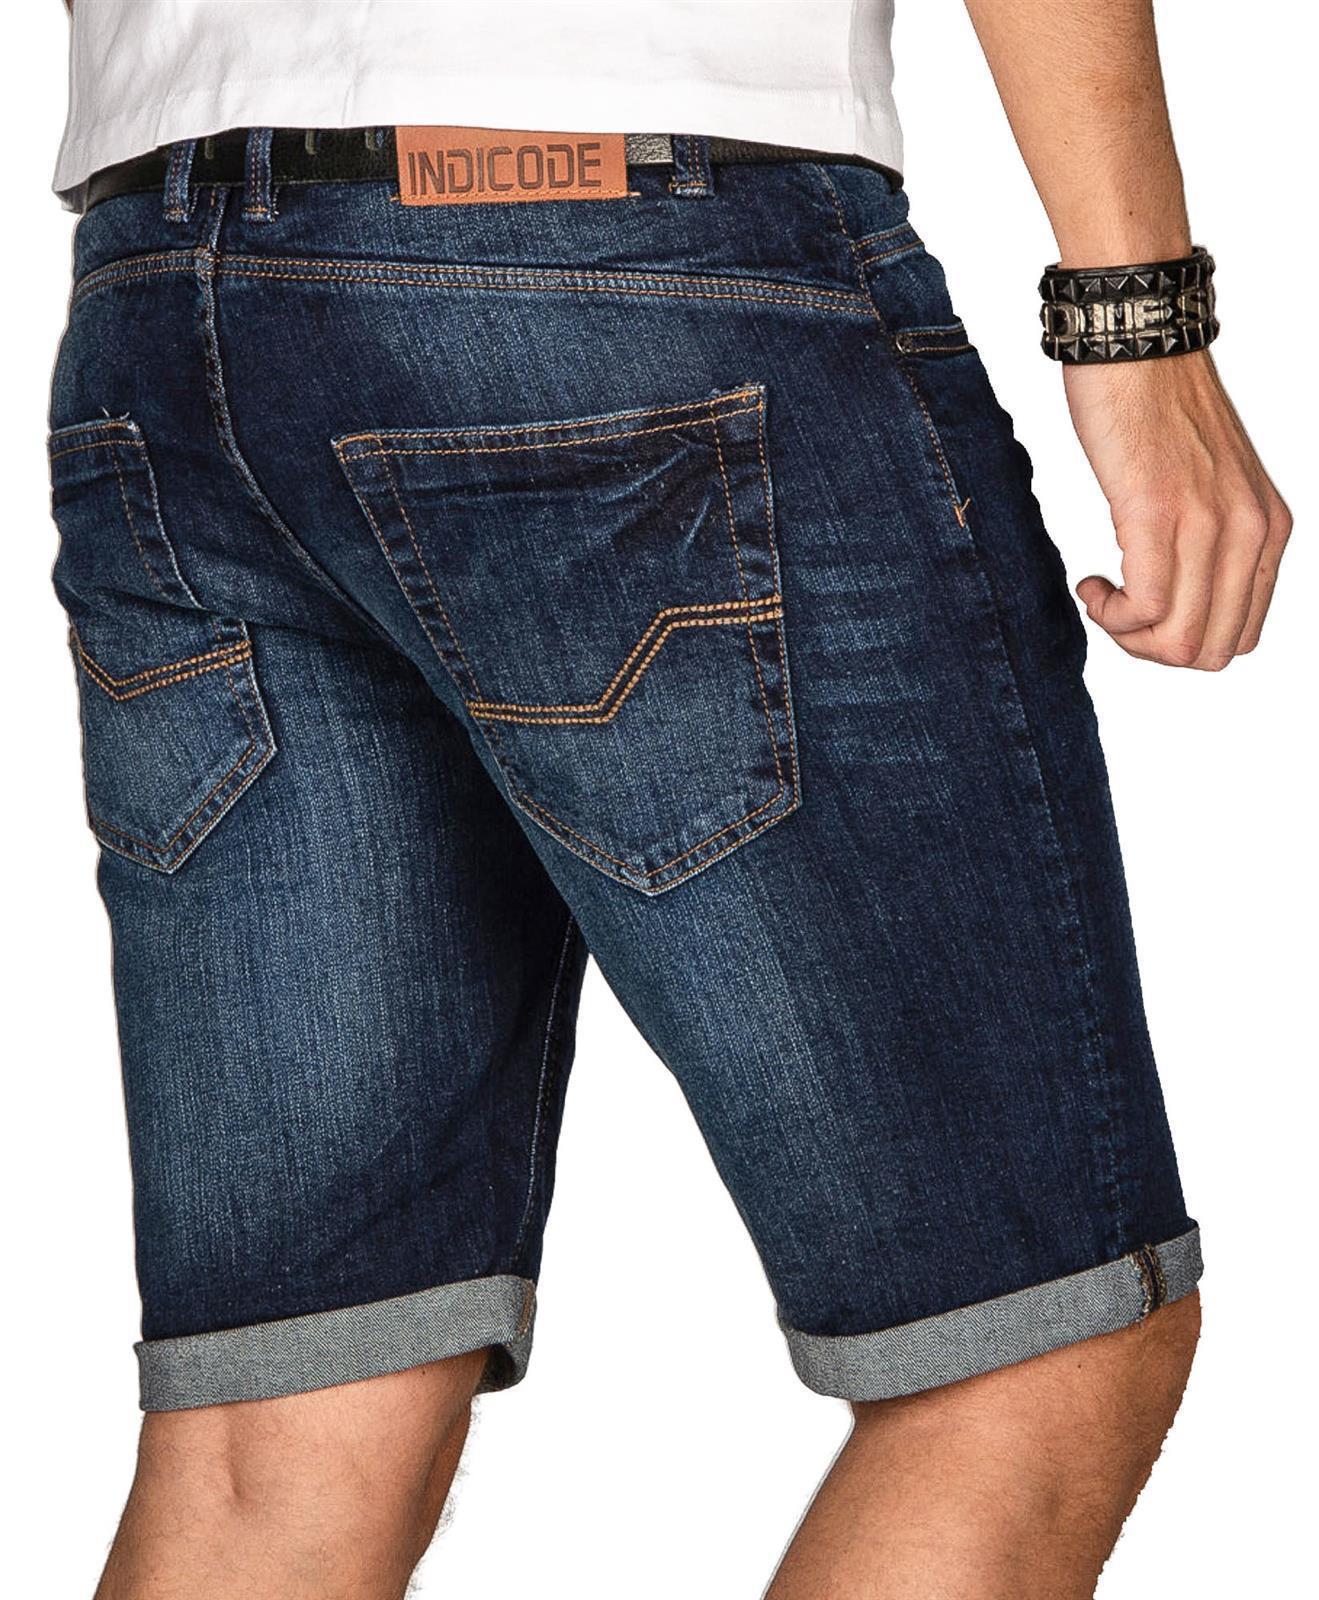 Indicode-Herren-Sommer-Bermuda-Jeans-Shorts-kurze-Hose-Sommerhose-Short-Neu-B556 Indexbild 34